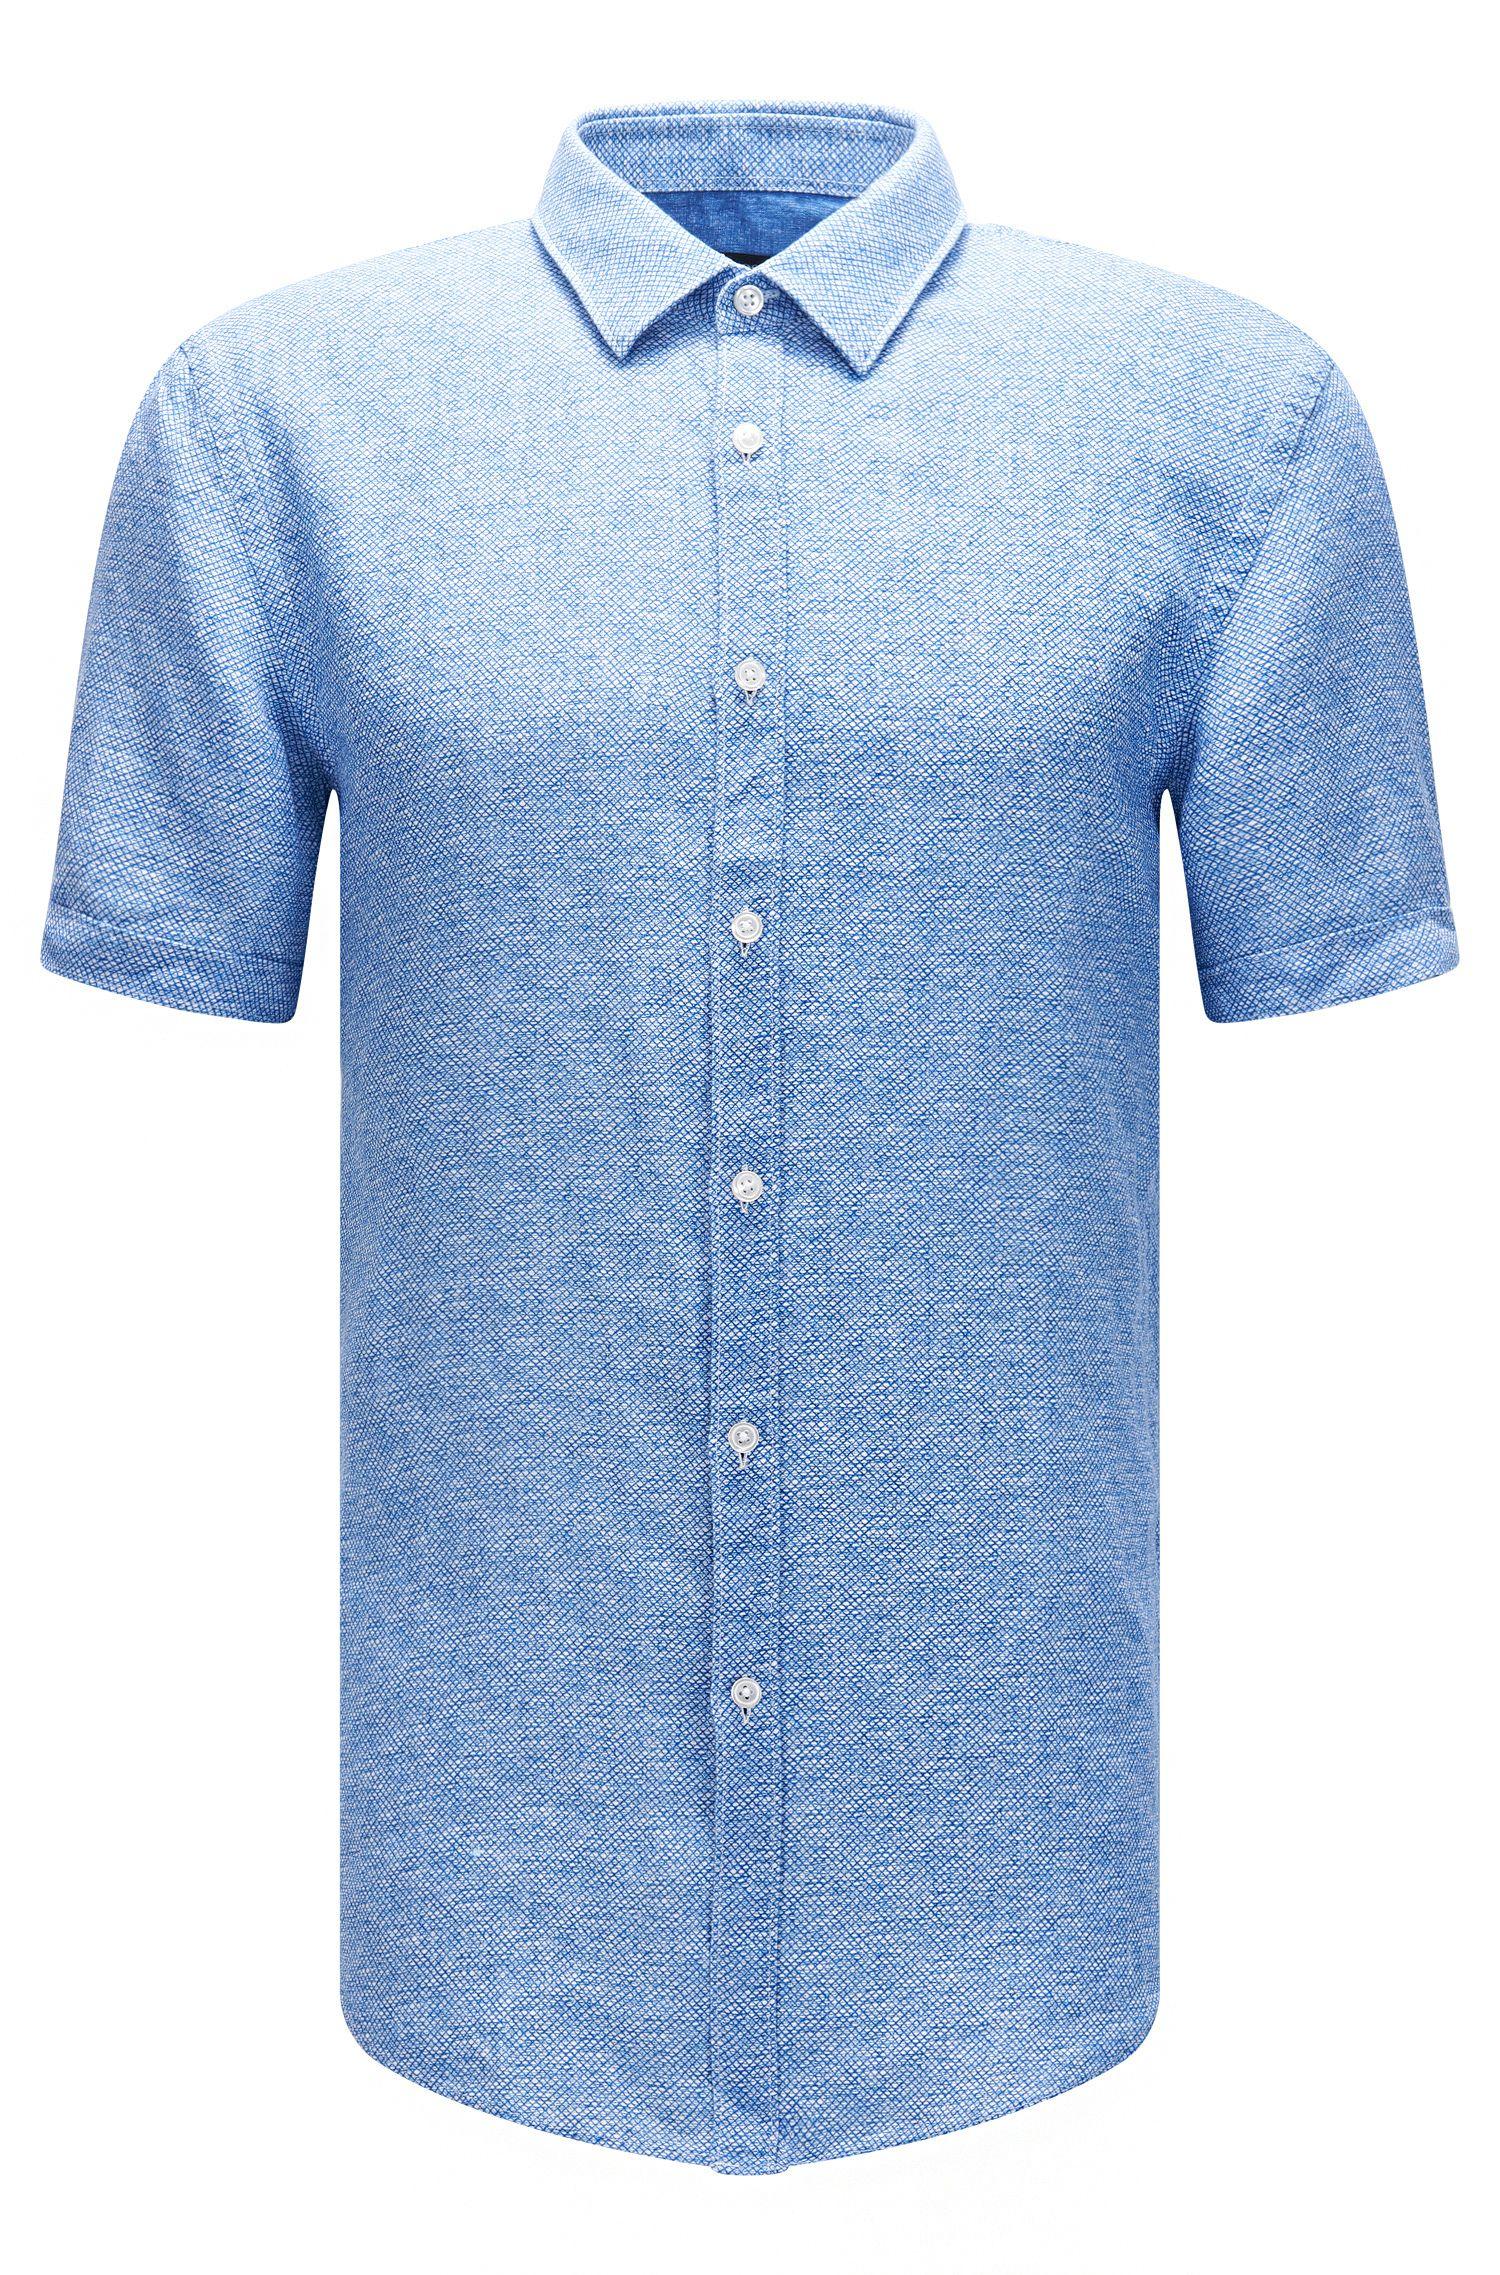 'Ronn' | Slim Fit, Linen Garment-Washed Button-Down Shirt